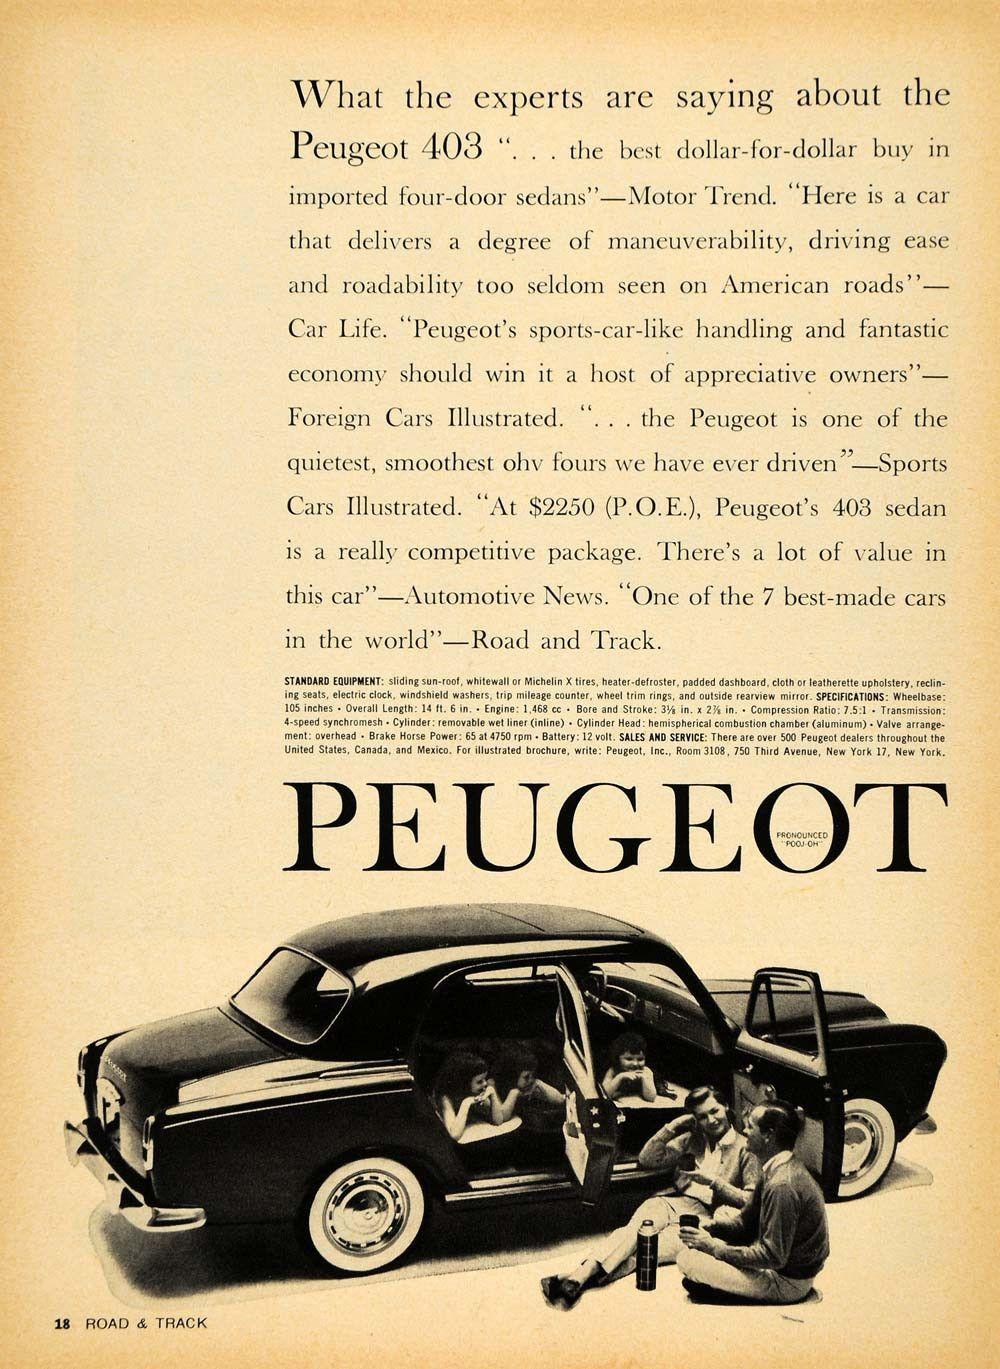 1959 Ad Peugeot 403 Foreign Vintage Sports Car Pricing - ORIGINAL ...